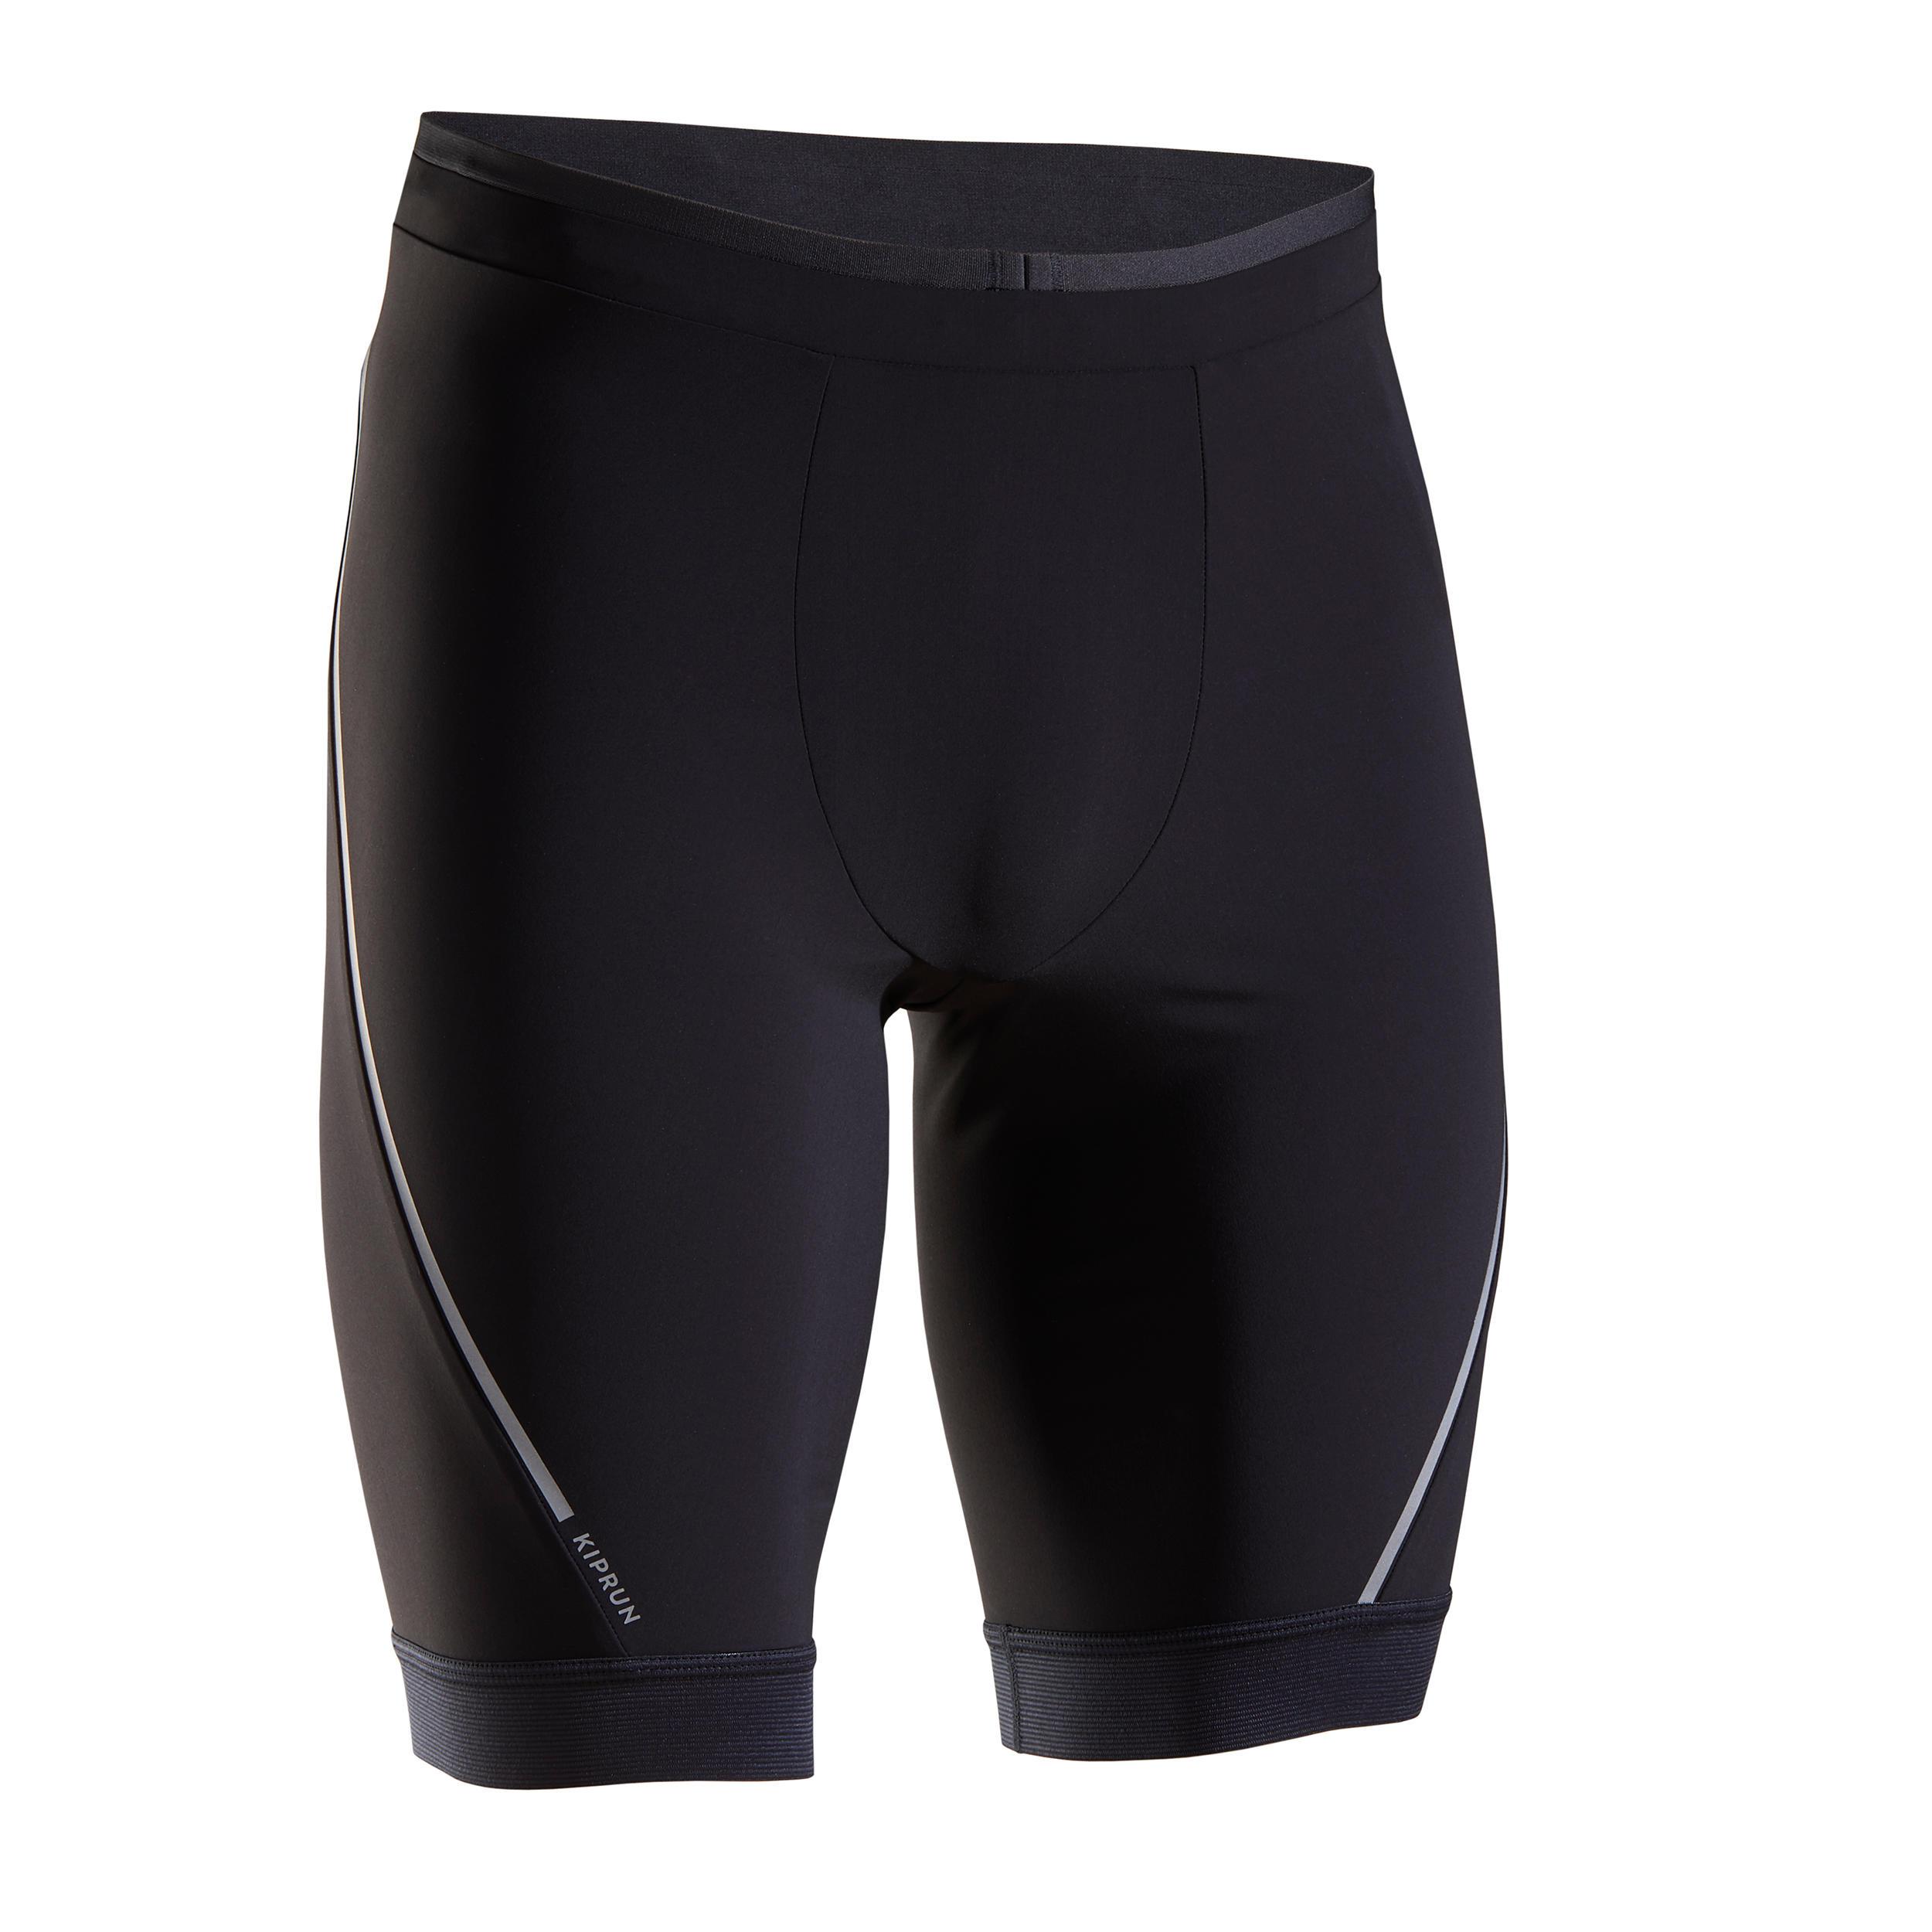 Laufshorts Tights Kiprun Herren | Sportbekleidung > Sporthosen > Laufhosen | Kiprun